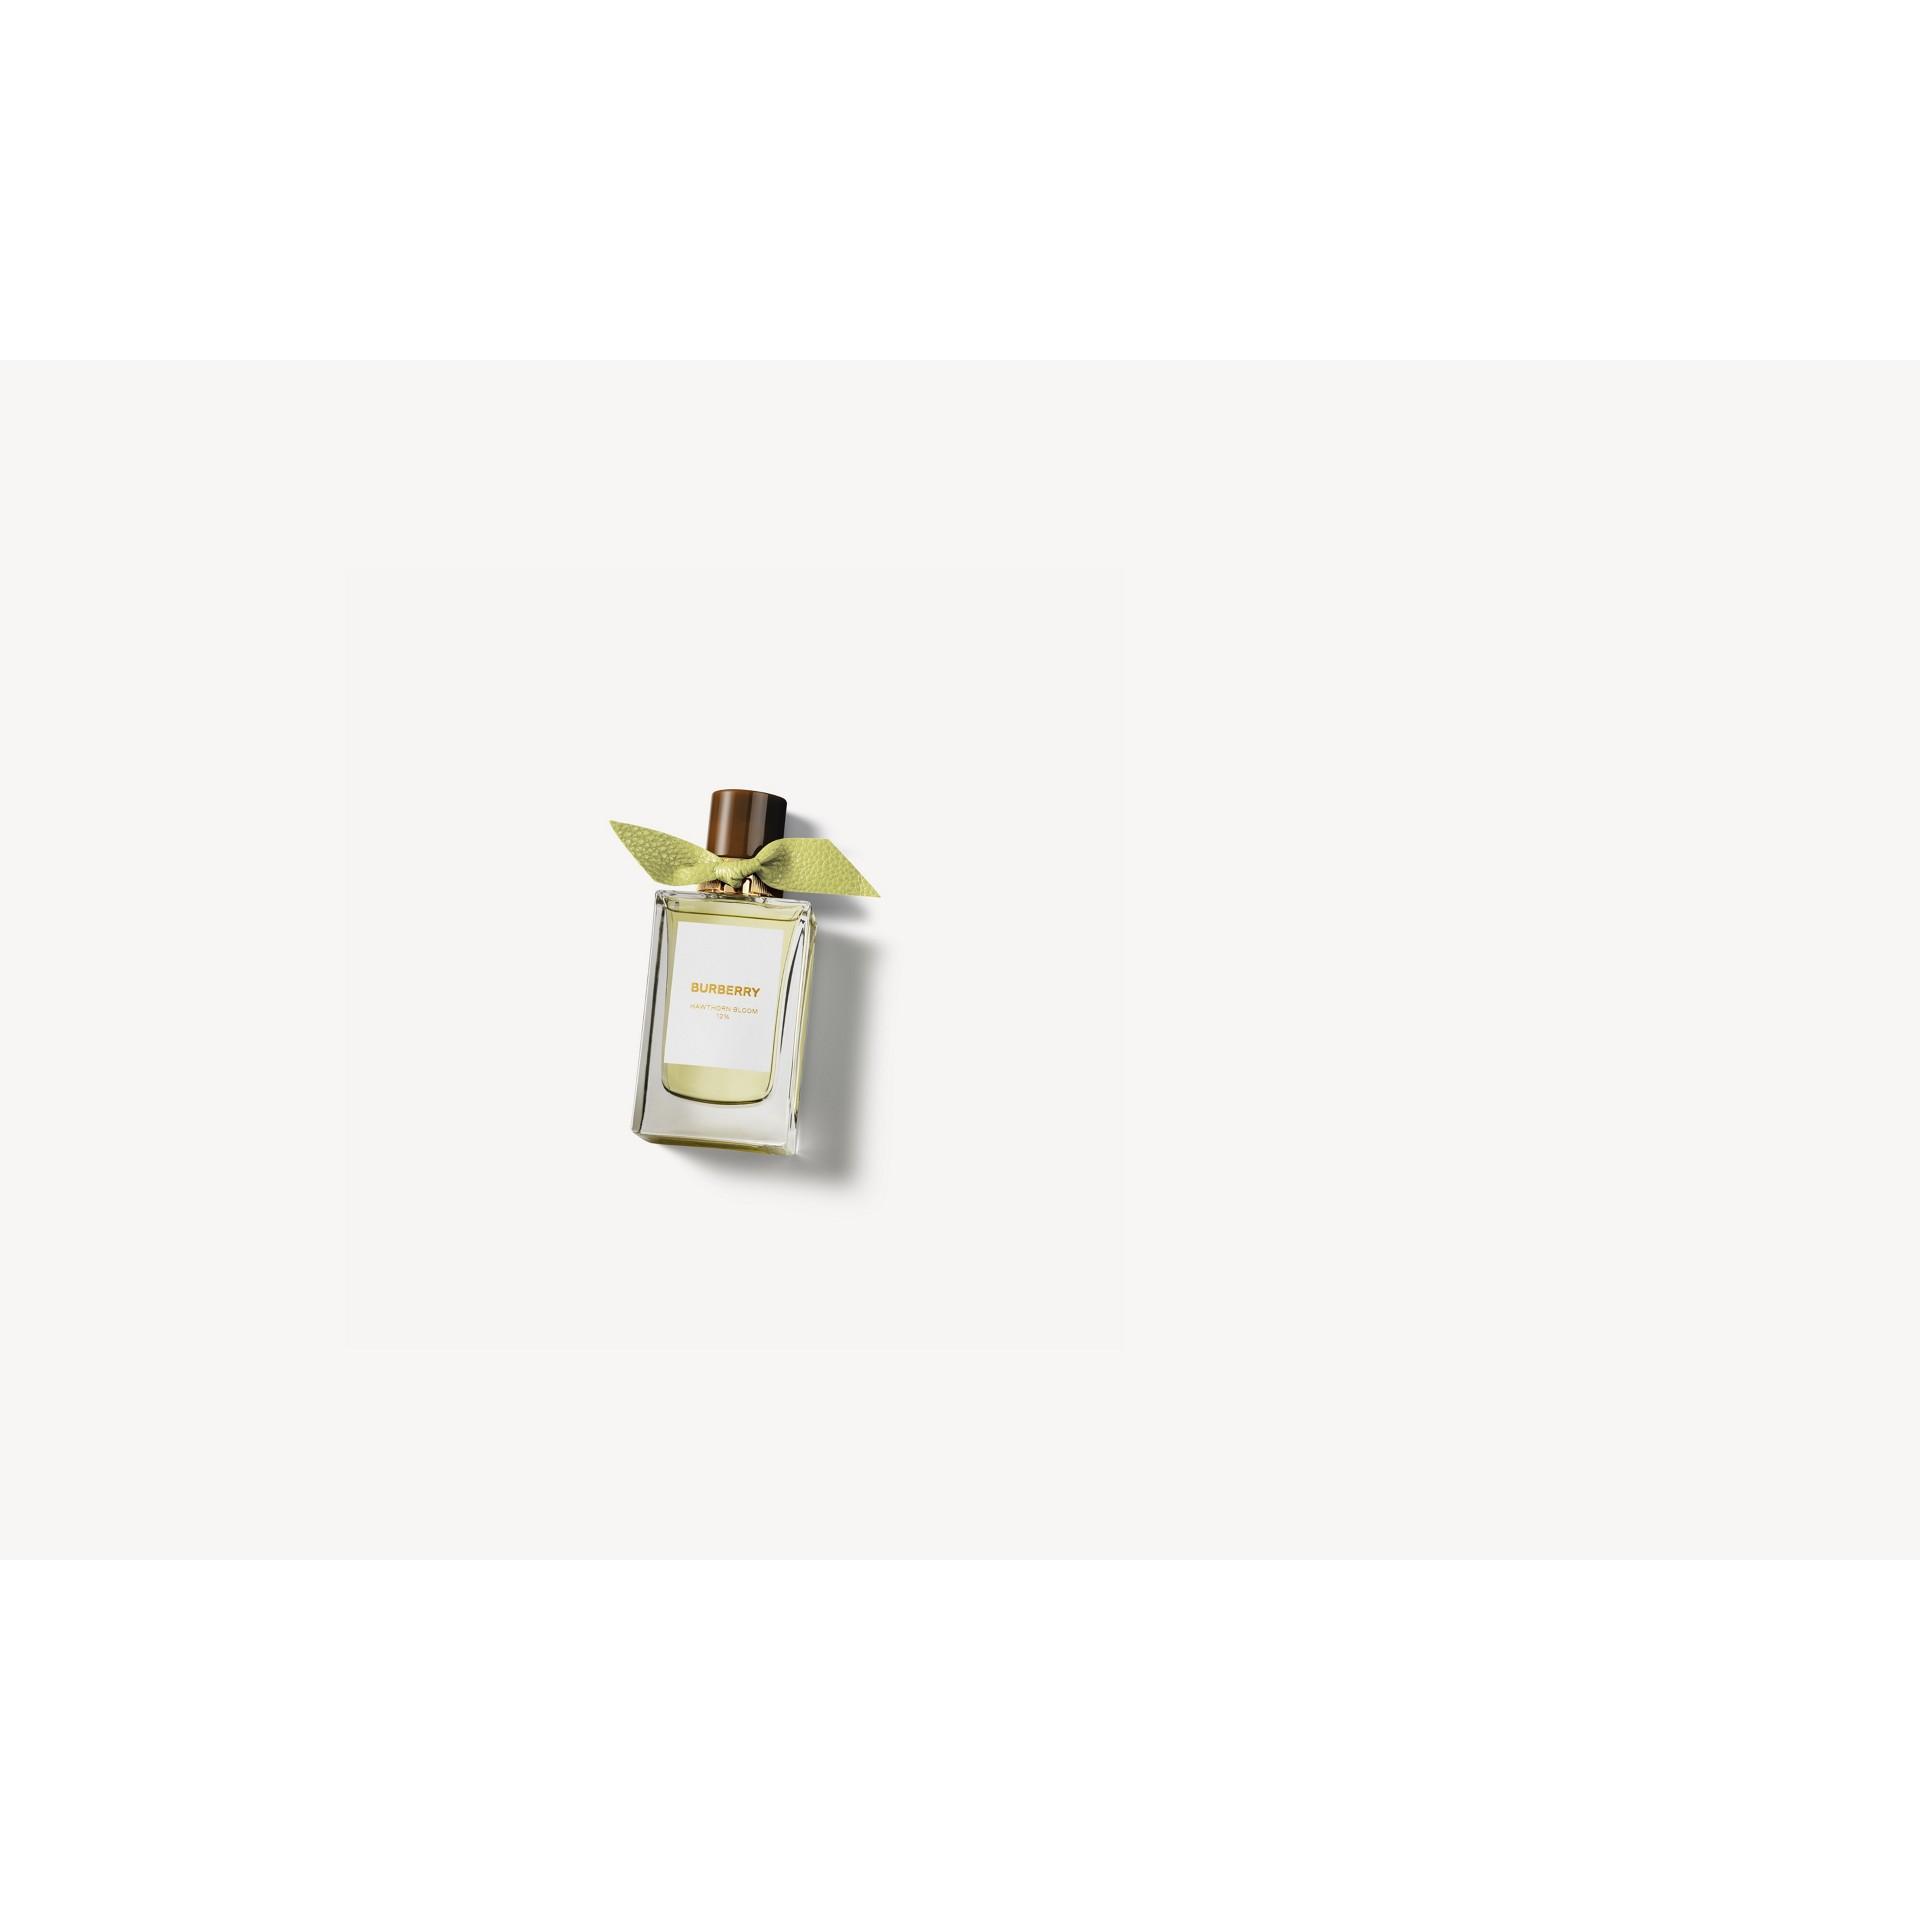 Burberry Signatures Hawthorn Bloom Eau de Parfum 100ml | Burberry - gallery image 1